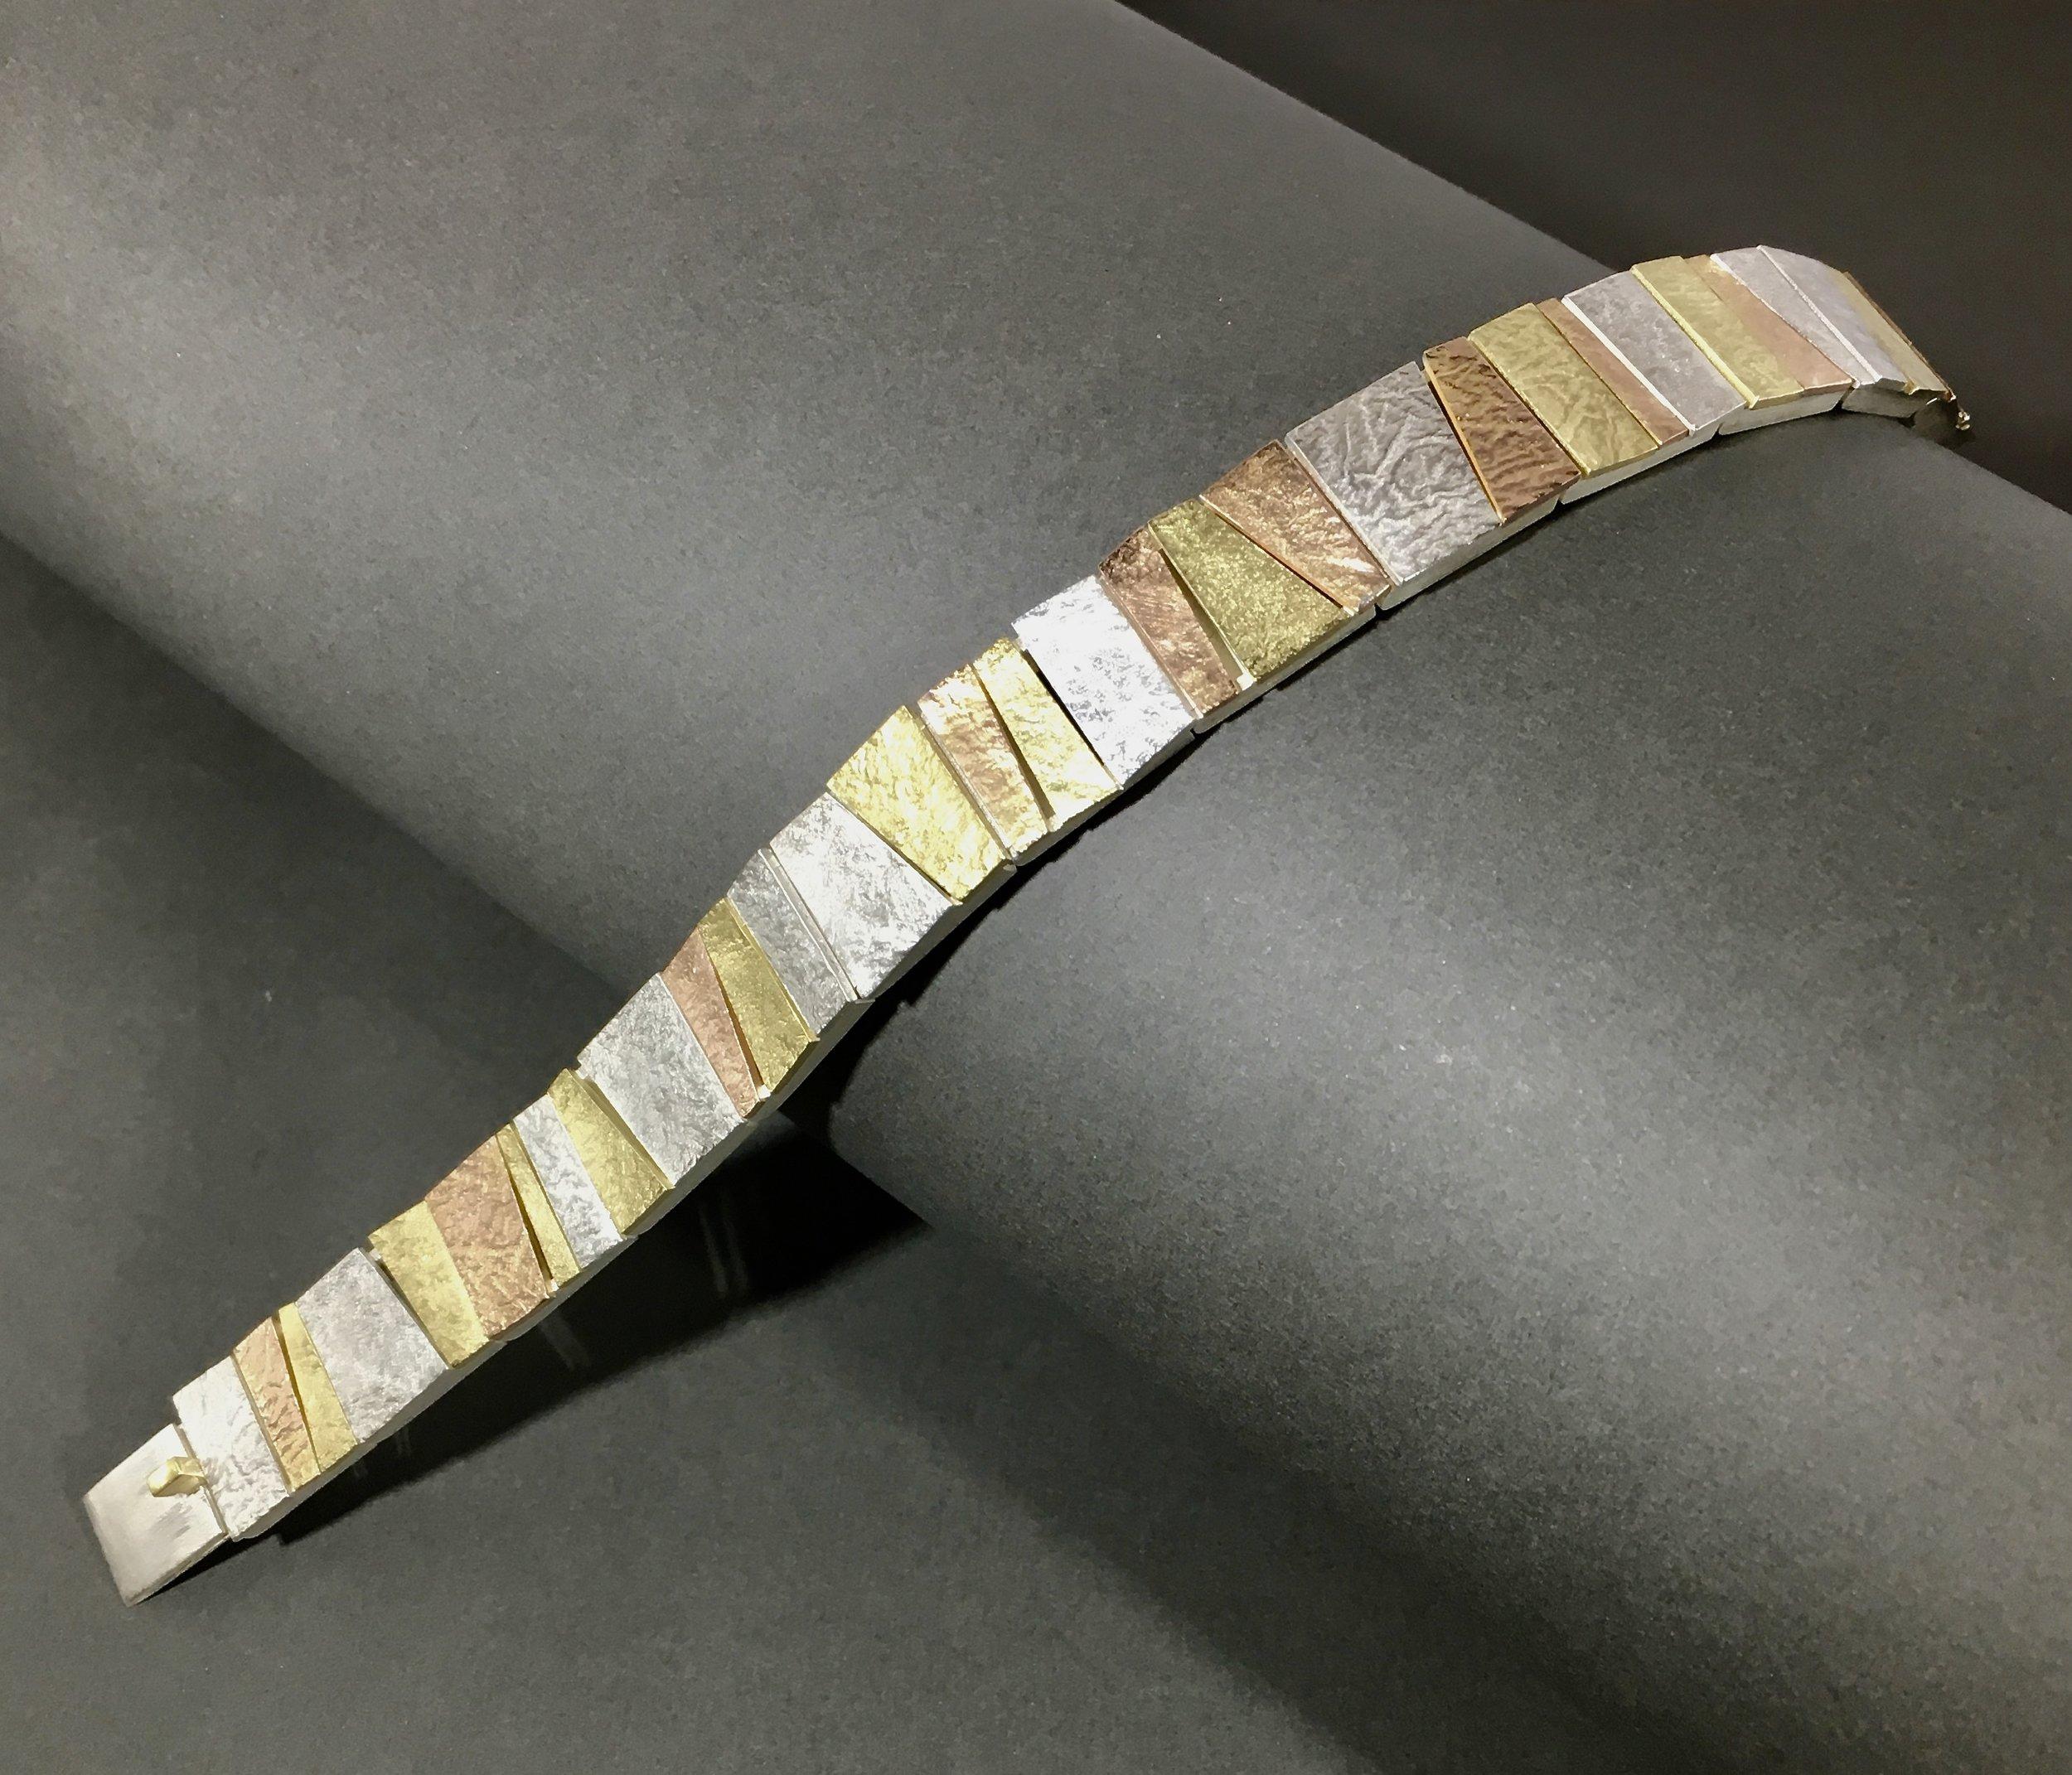 flexible link bracelet, multi colored gold, silver